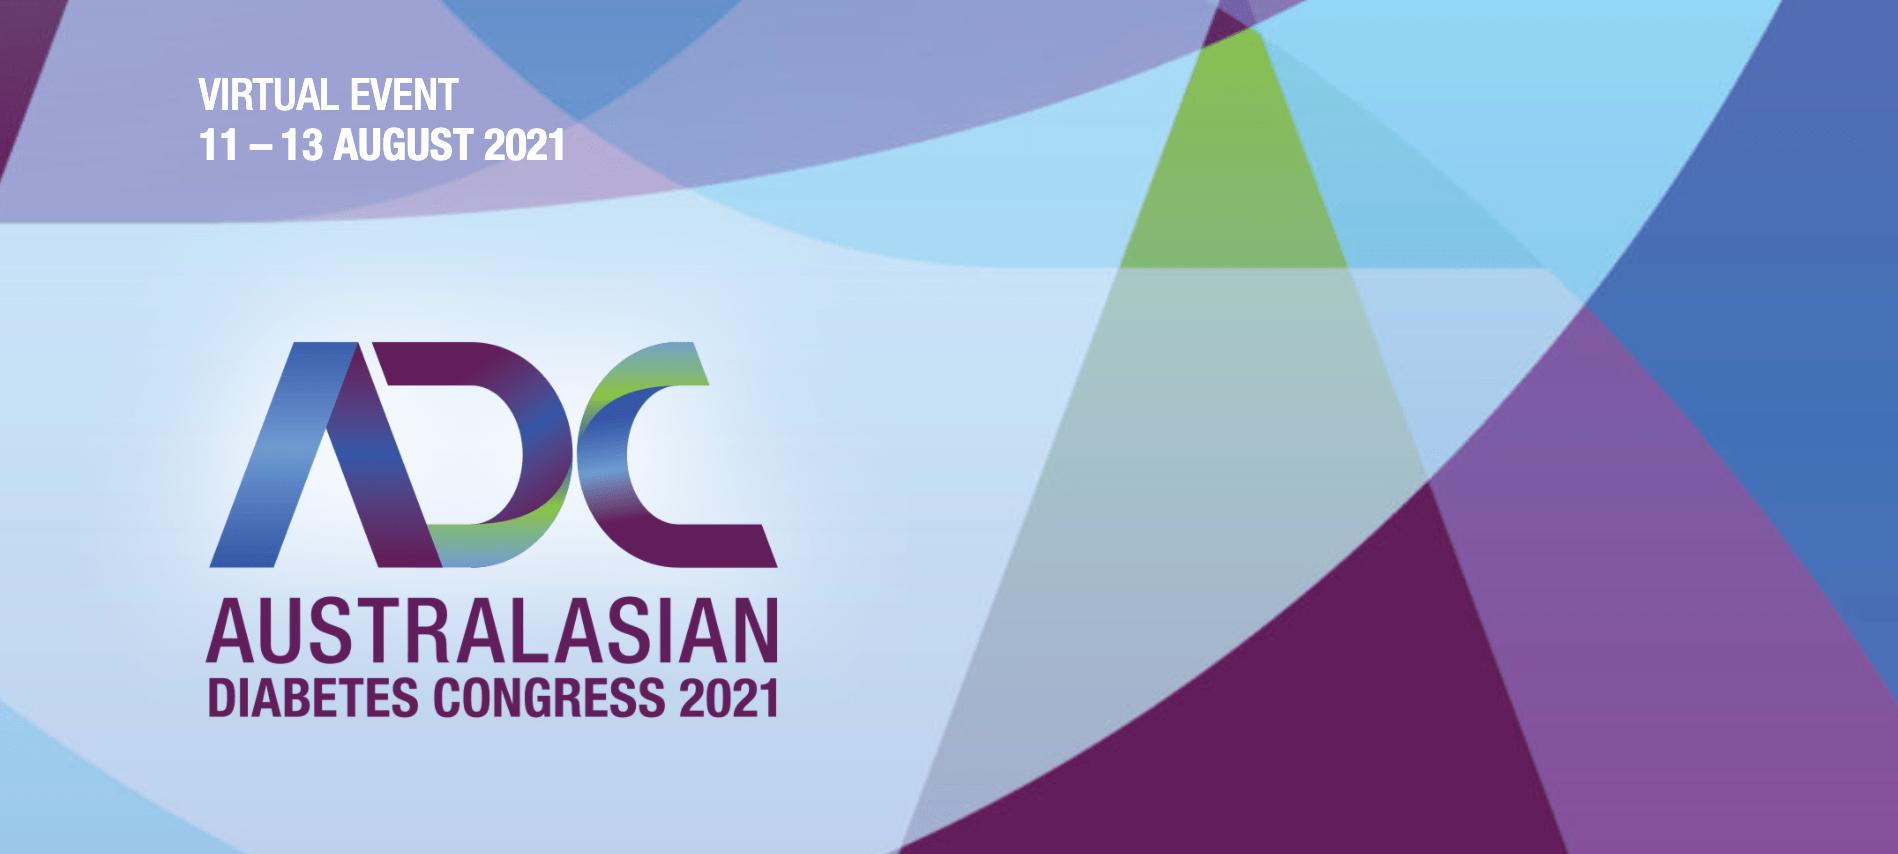 Highlights of the 2021 virtual Australasian Diabetes Congress